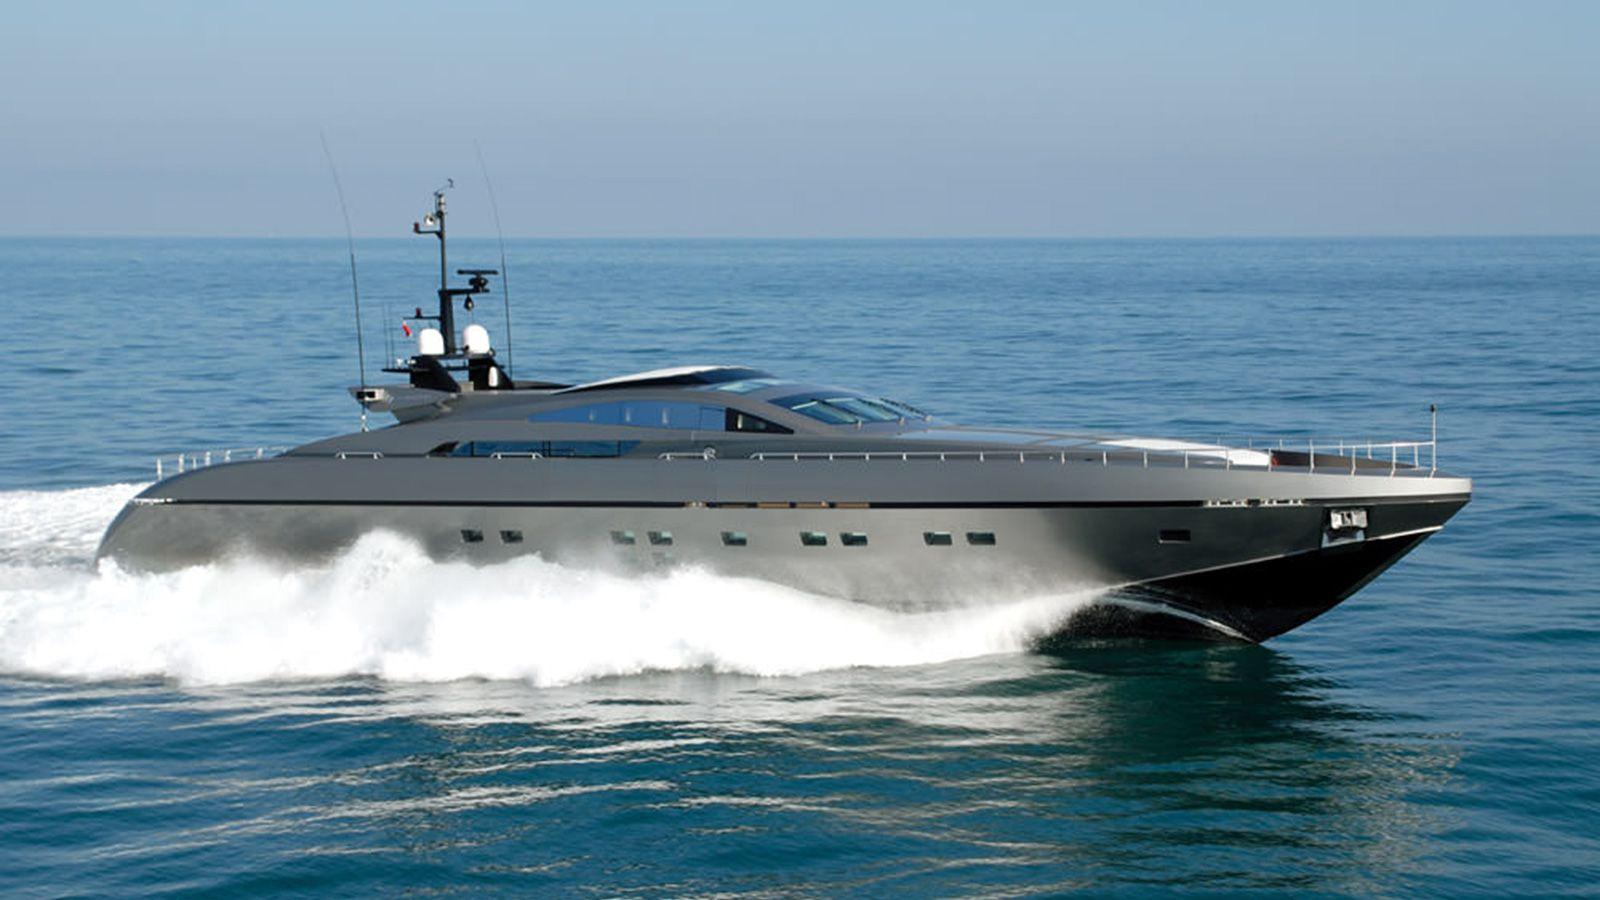 Villainous Superyacht Pure Insanity Docks In Miami